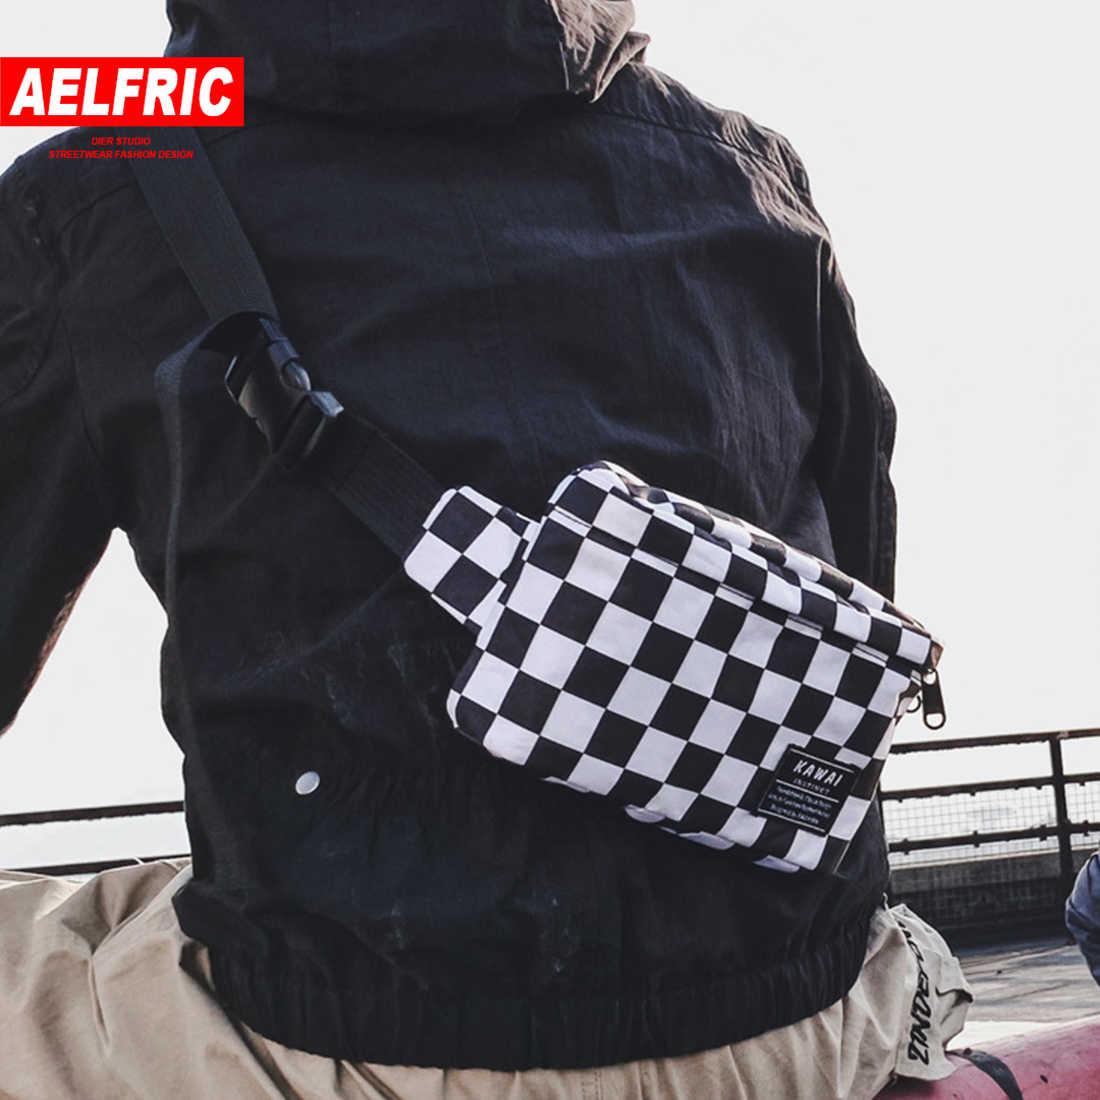 AELFRIC Hip Hop 2019 Nieuwe Mode Vrouwen Mannen Bum Bag Leisure Plaid Schoudertas Fanny Pack Brief Telefoon Heuptas packs Streetwear